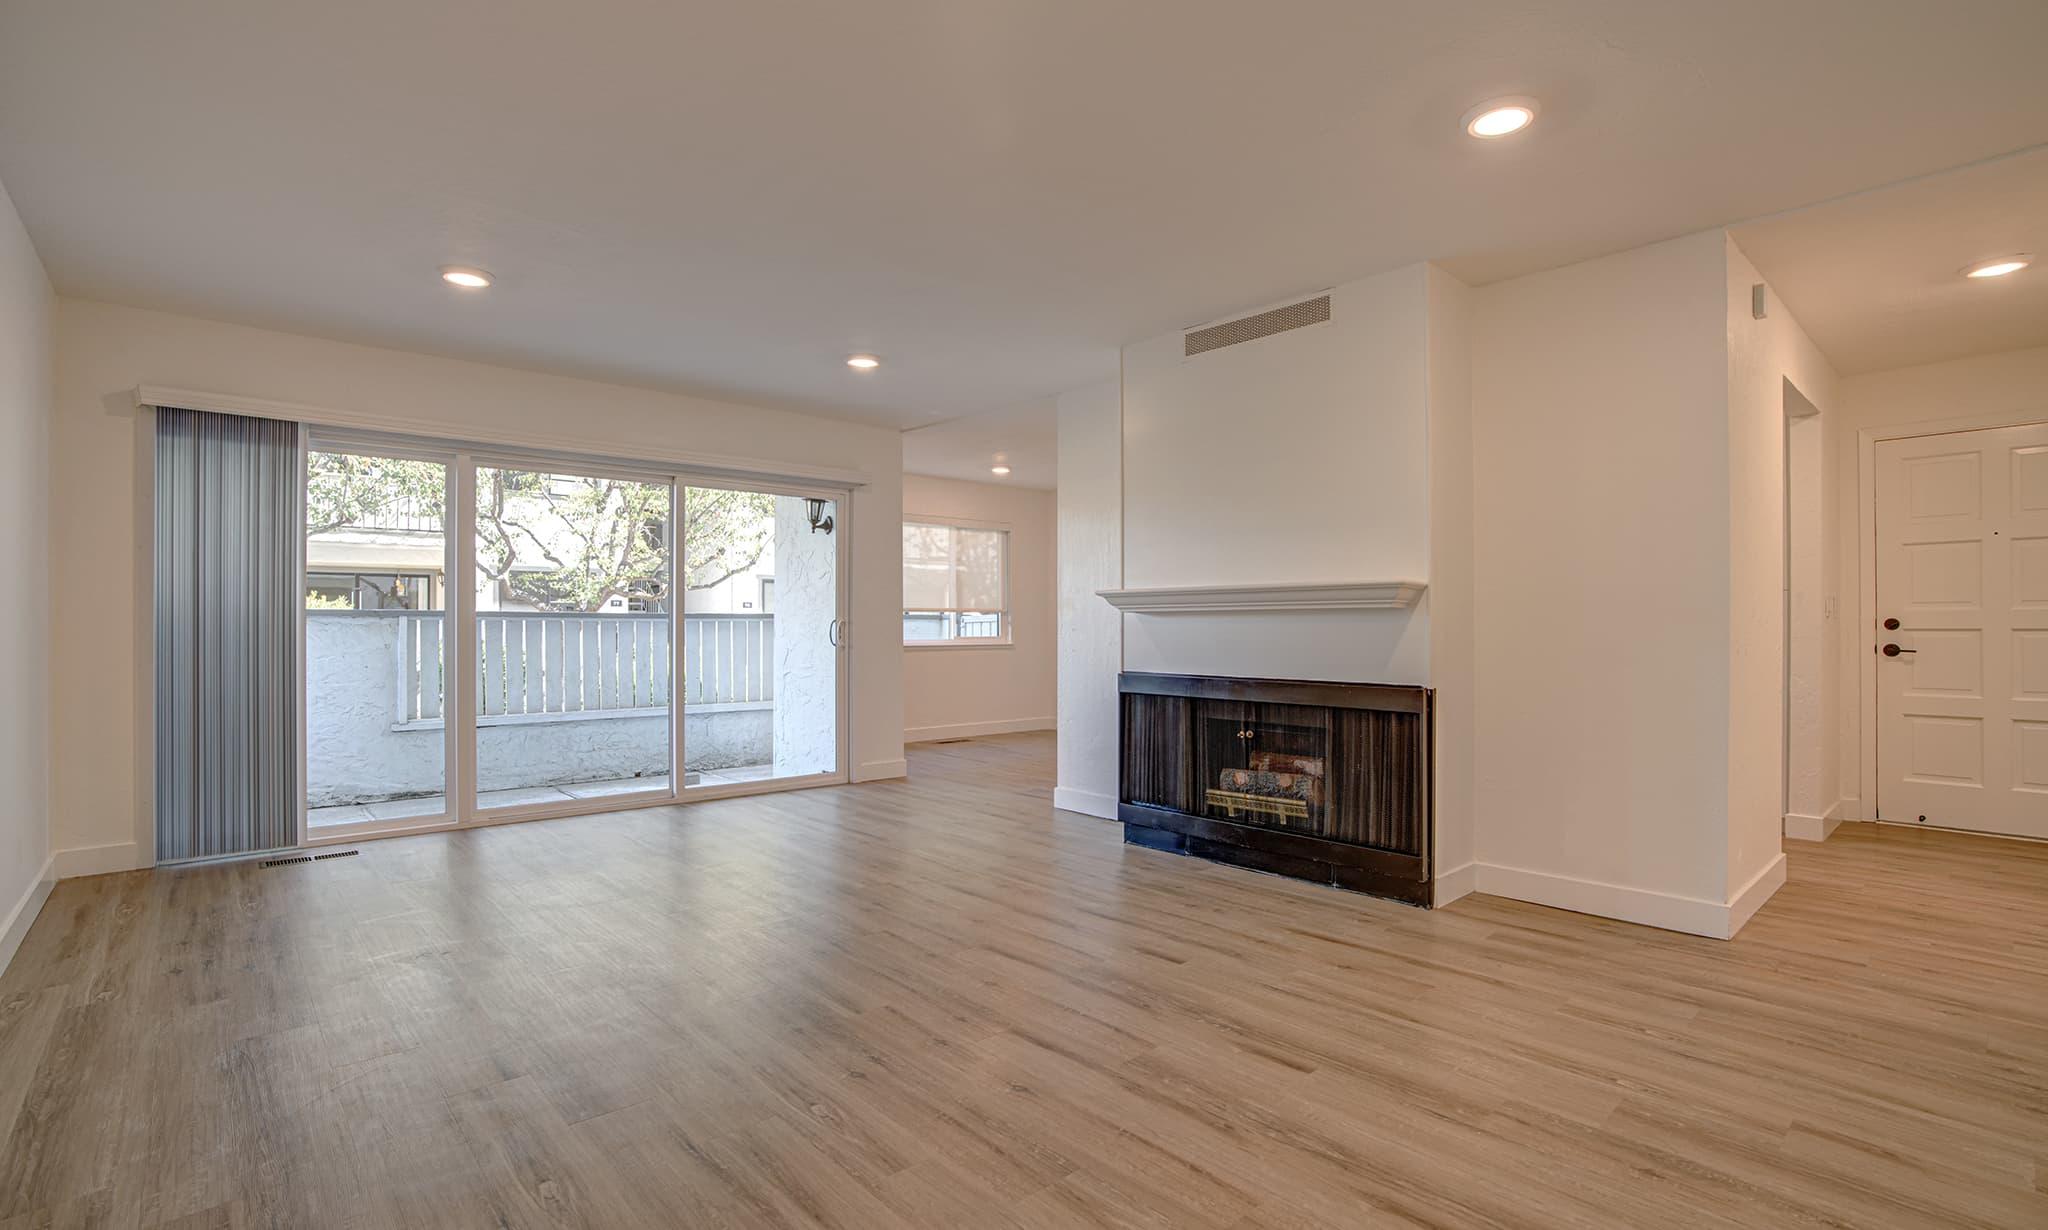 Verandas at Cupertino Apartments apartments in Cupertino CA to rent photo 6